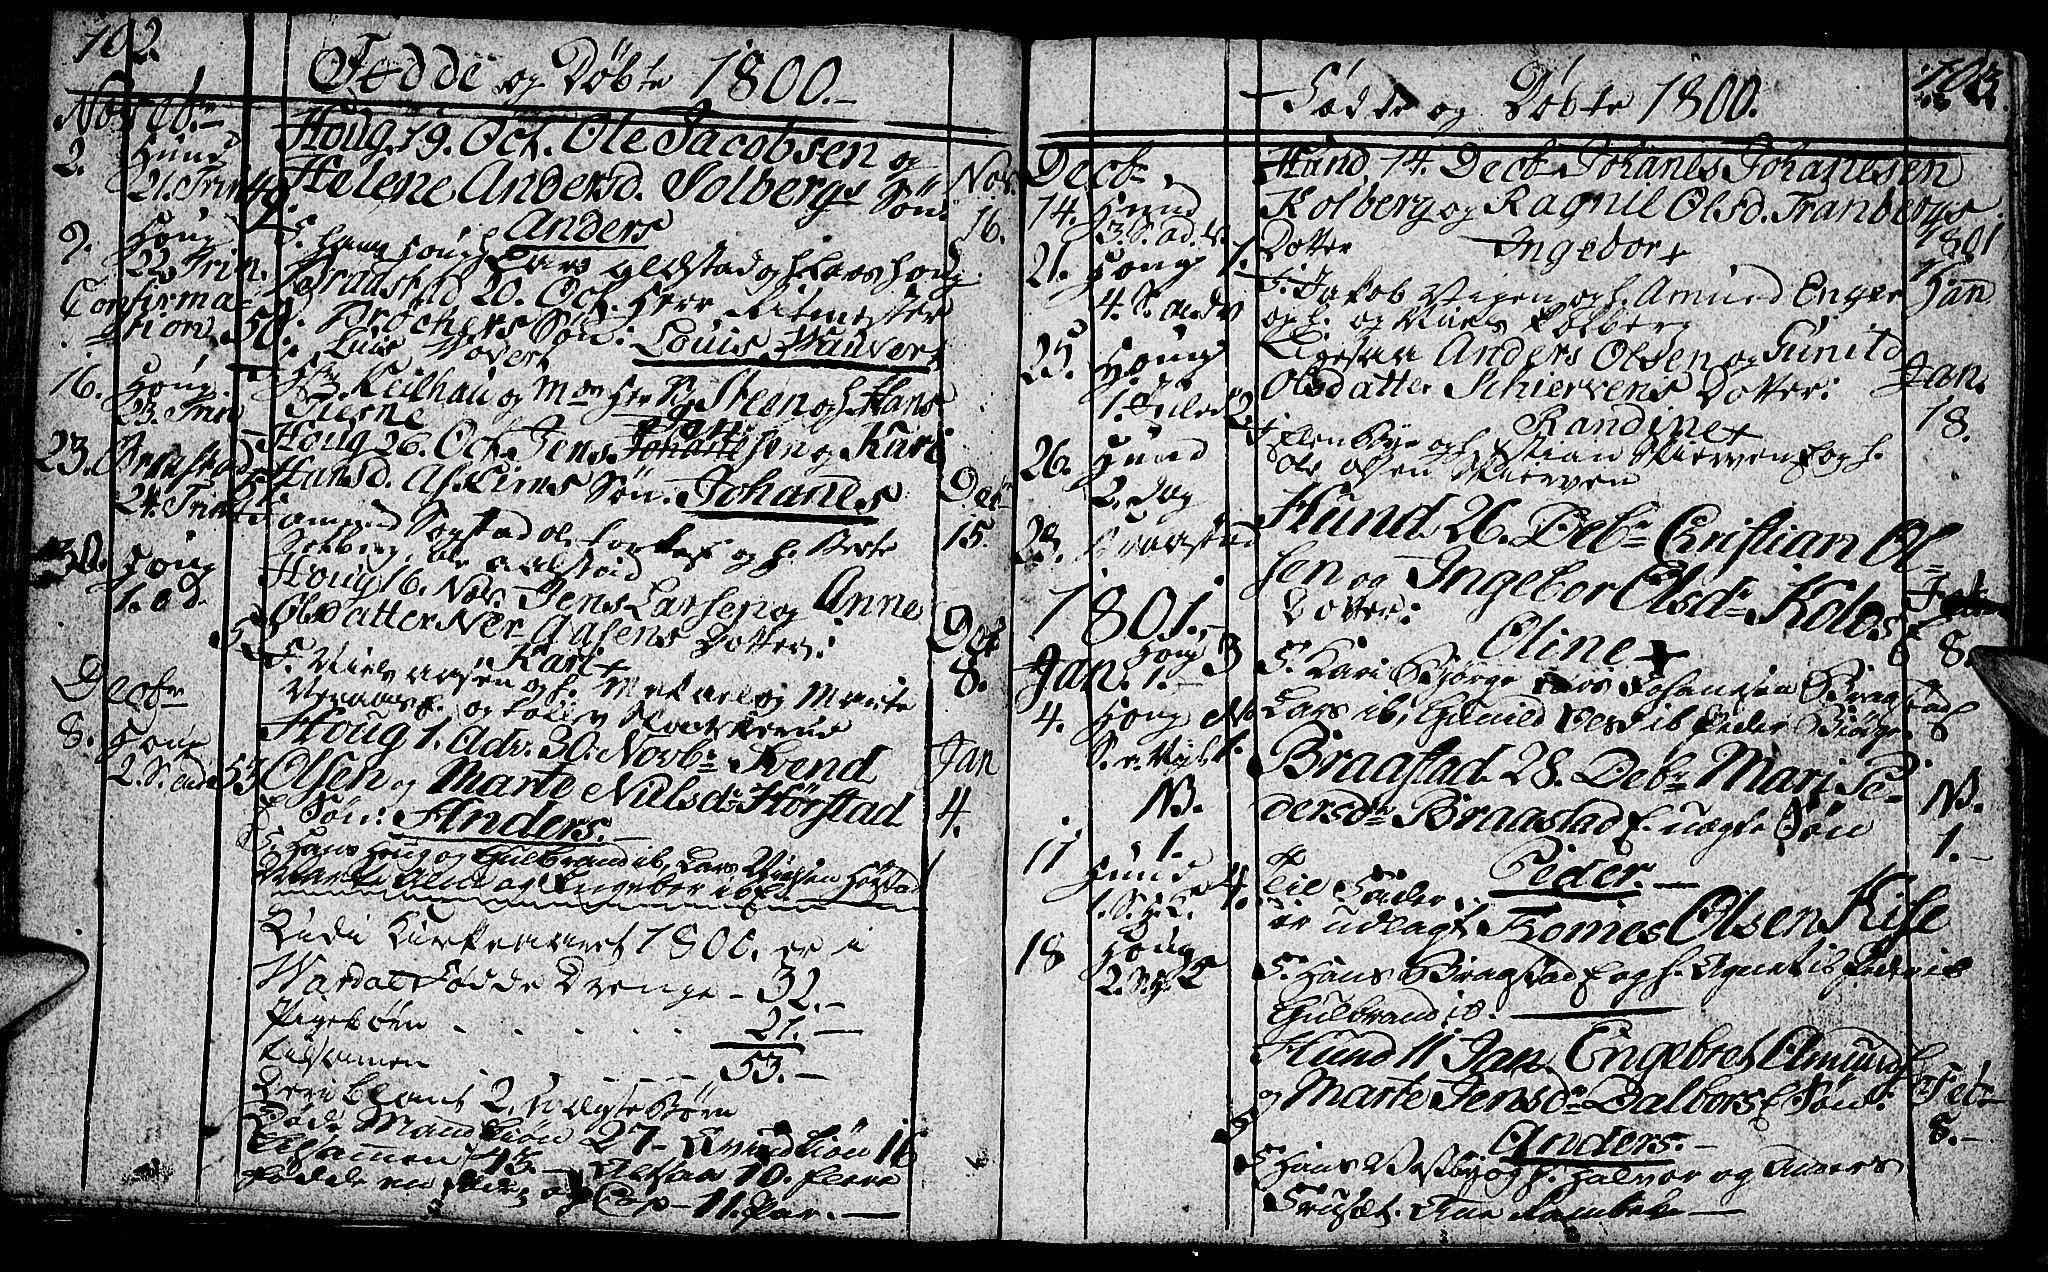 SAH, Vardal prestekontor, H/Ha/Hab/L0002: Klokkerbok nr. 2, 1790-1803, s. 102-103